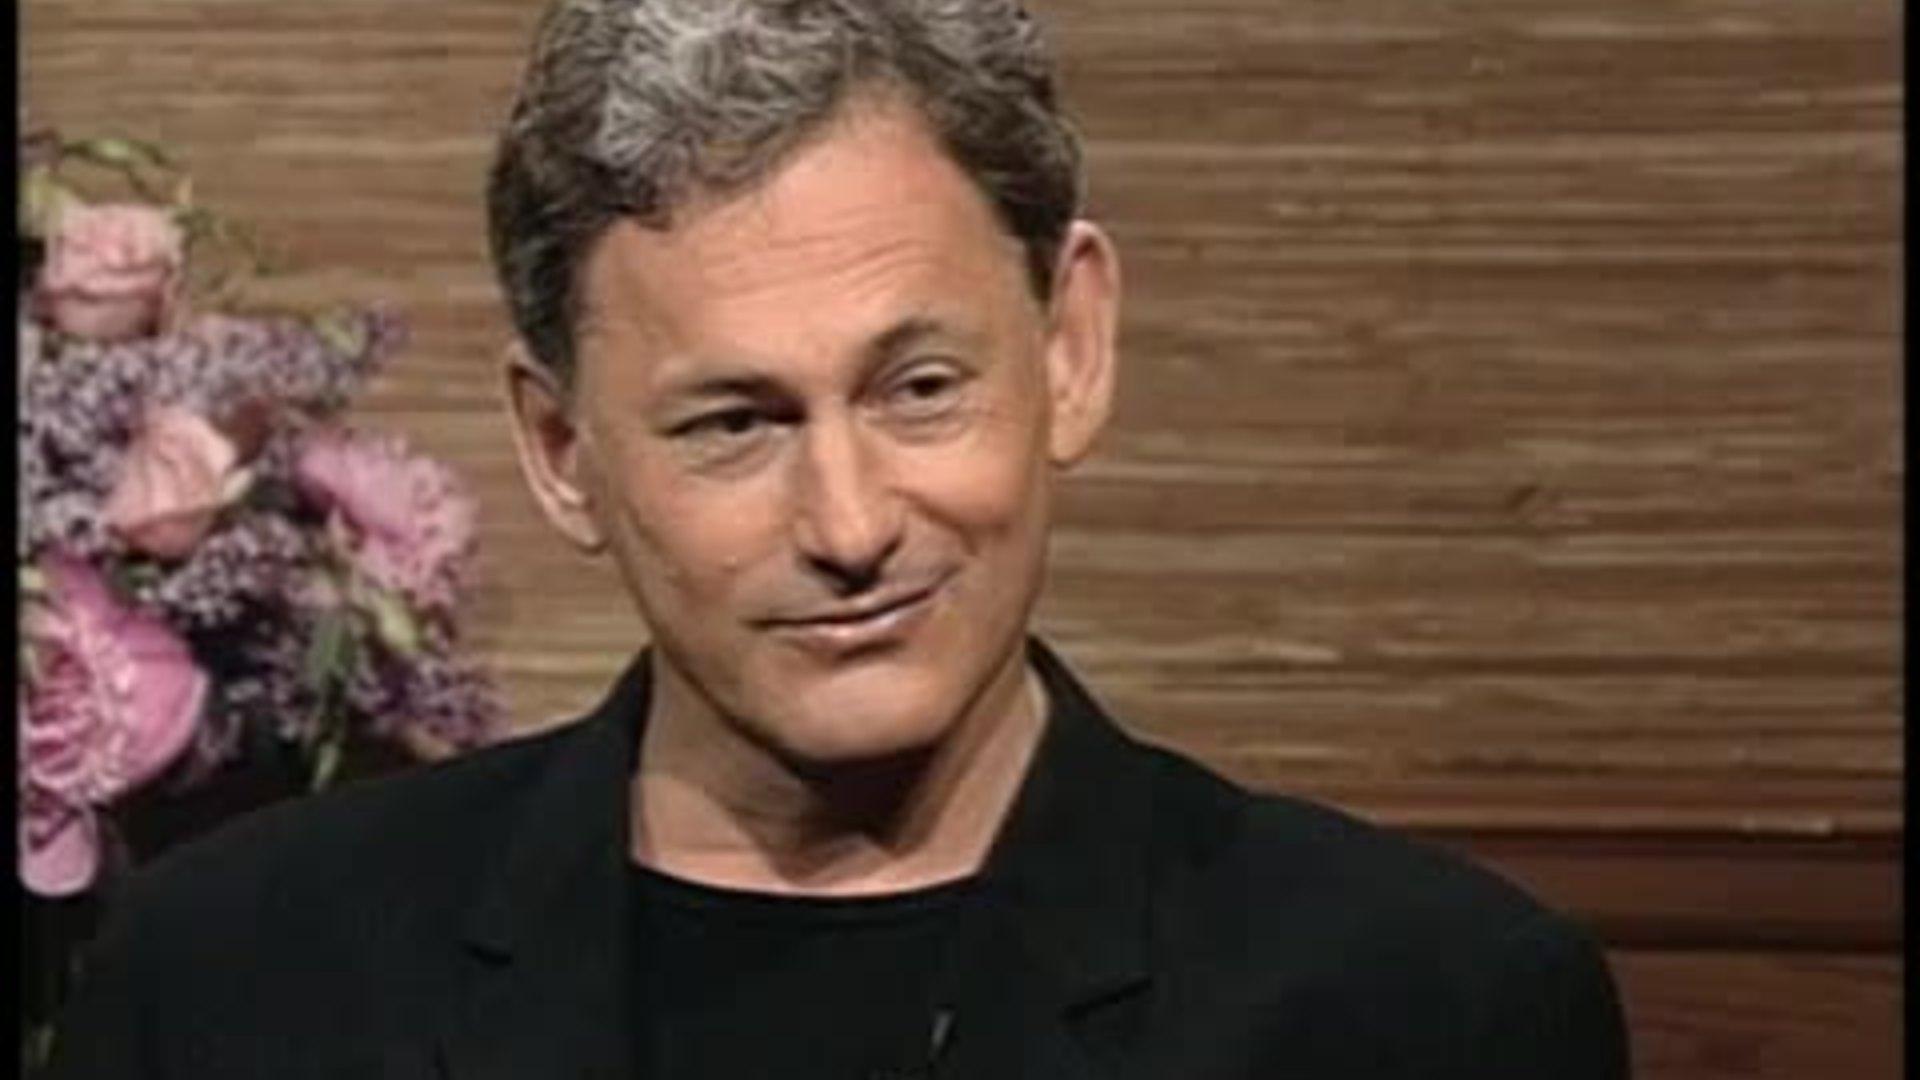 Peter Cureton,Dorothy Revier Adult gallery Imaan Hammam NED 1 2014,Jackie Hoffman born November 29, 1960 (age 57)